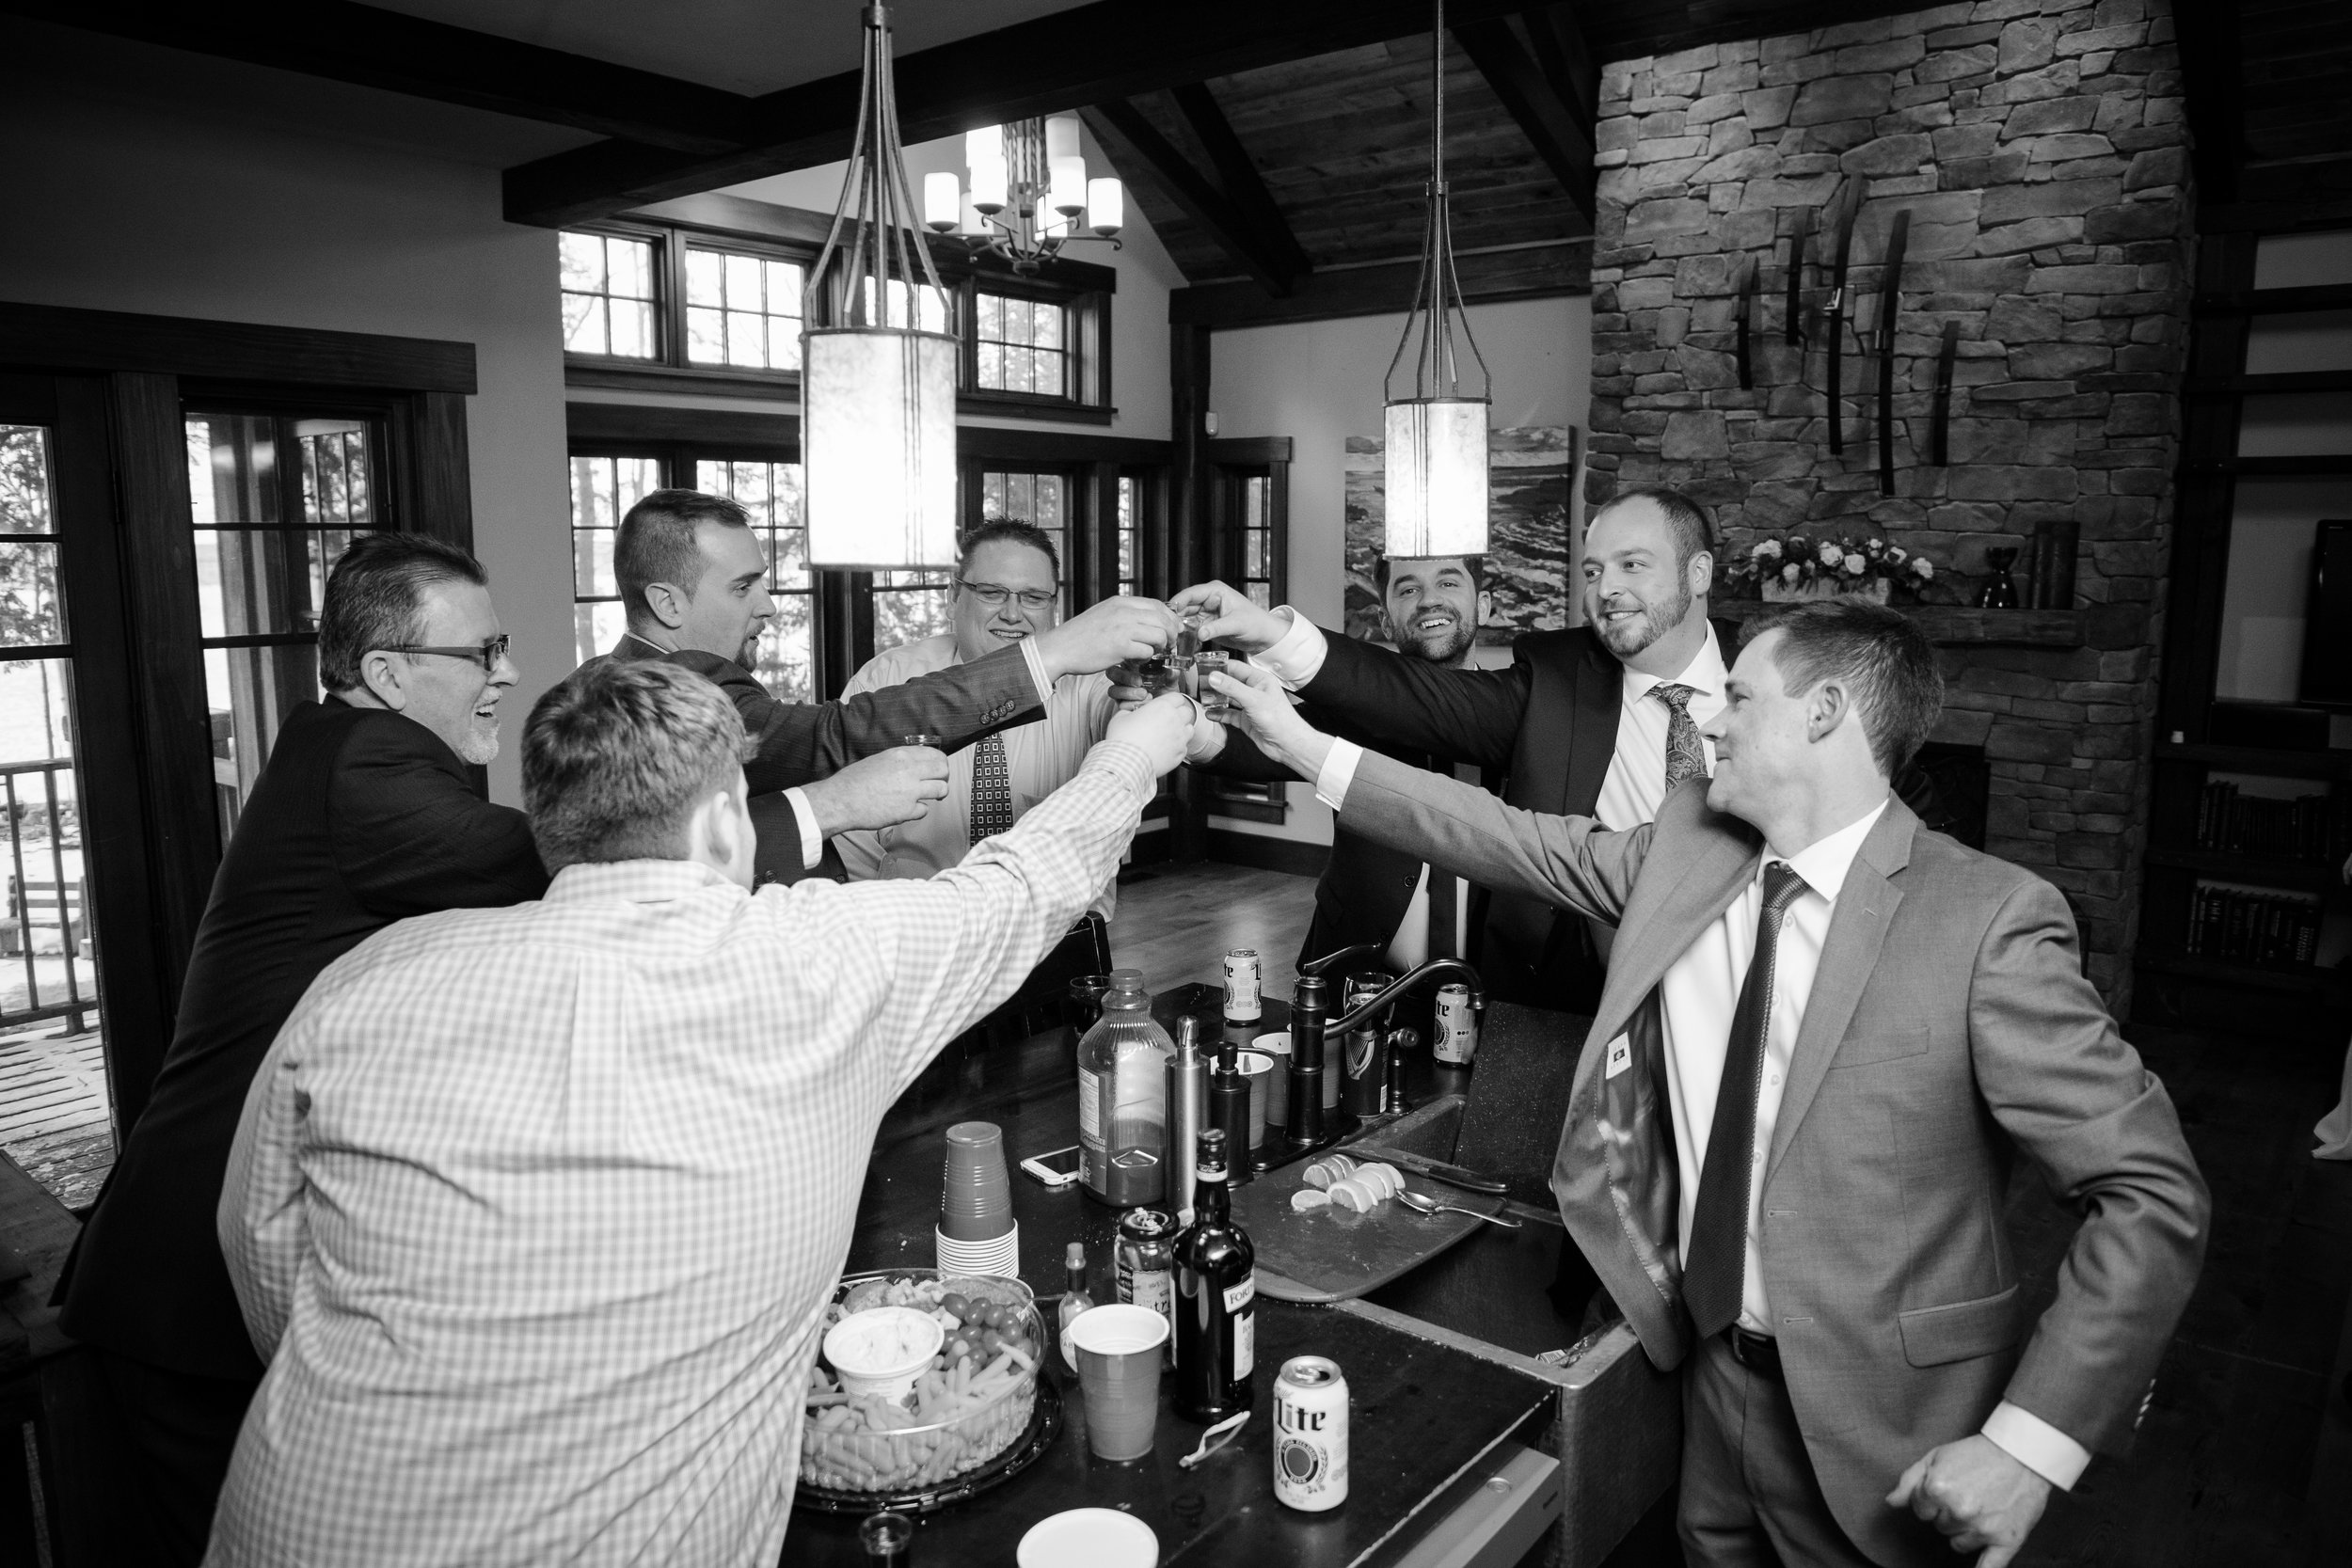 The-Griffiths-Wedding-10-03-10-245.jpg